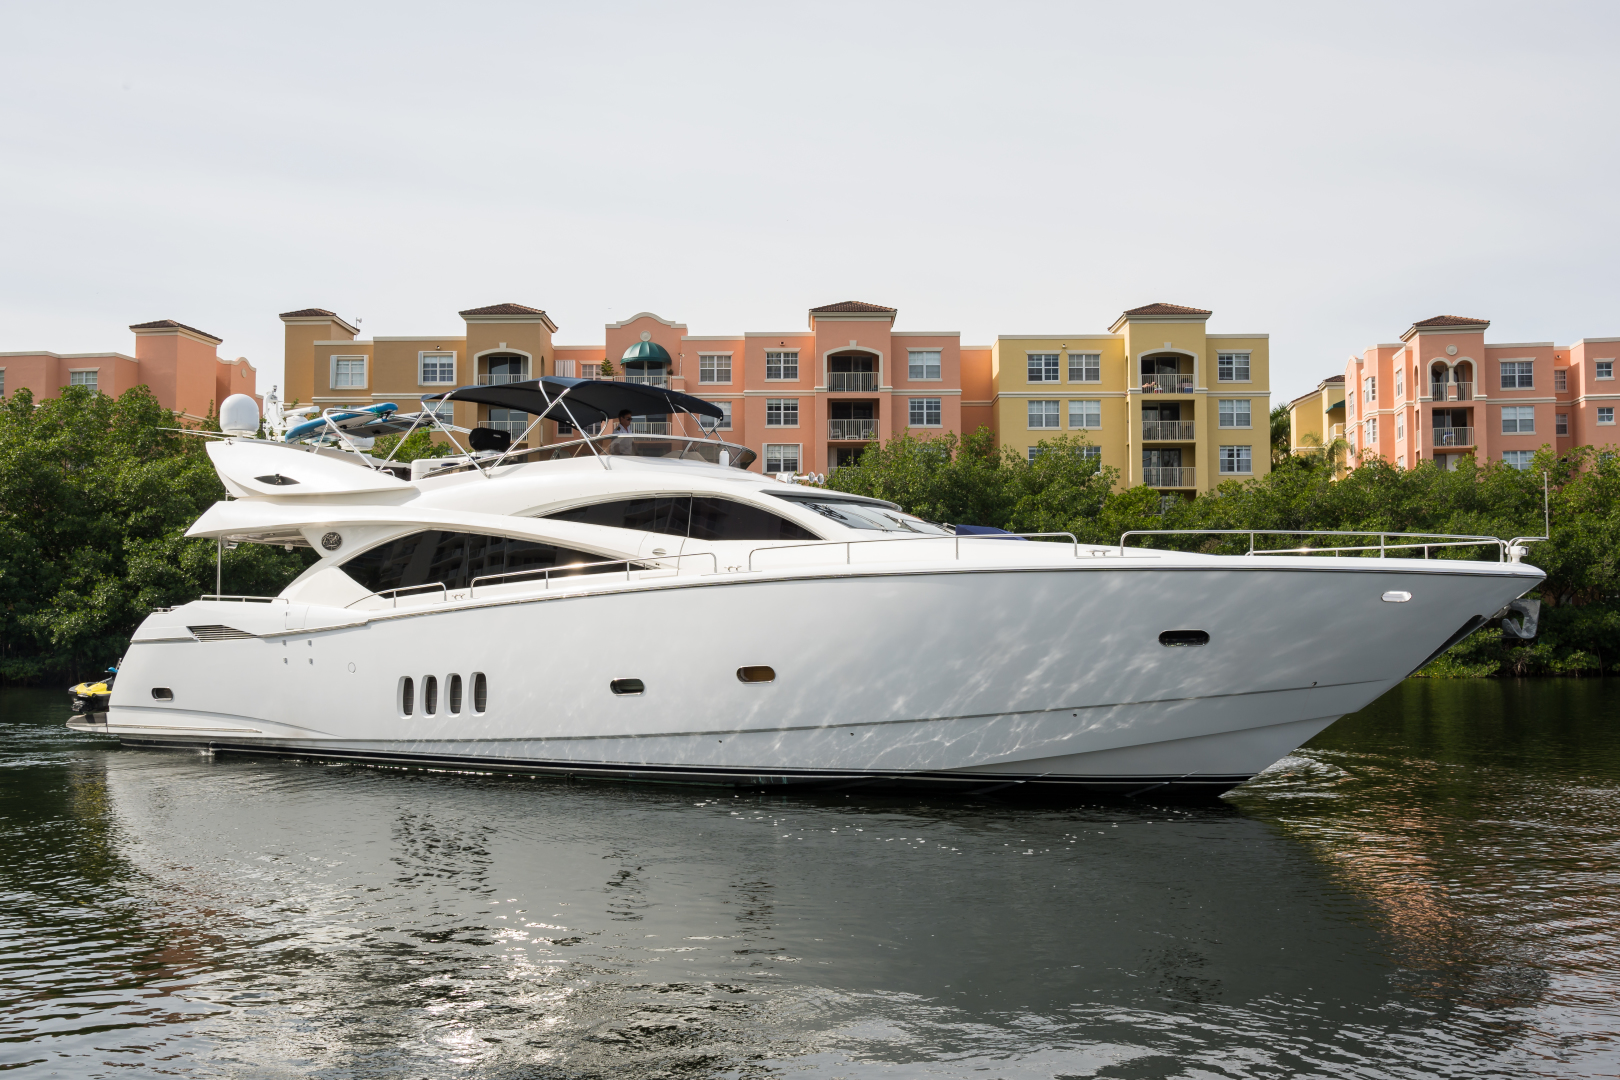 Sunseeker-Yacht 2004-TOP GUN Aventura-Florida-United States-1450699 | Thumbnail